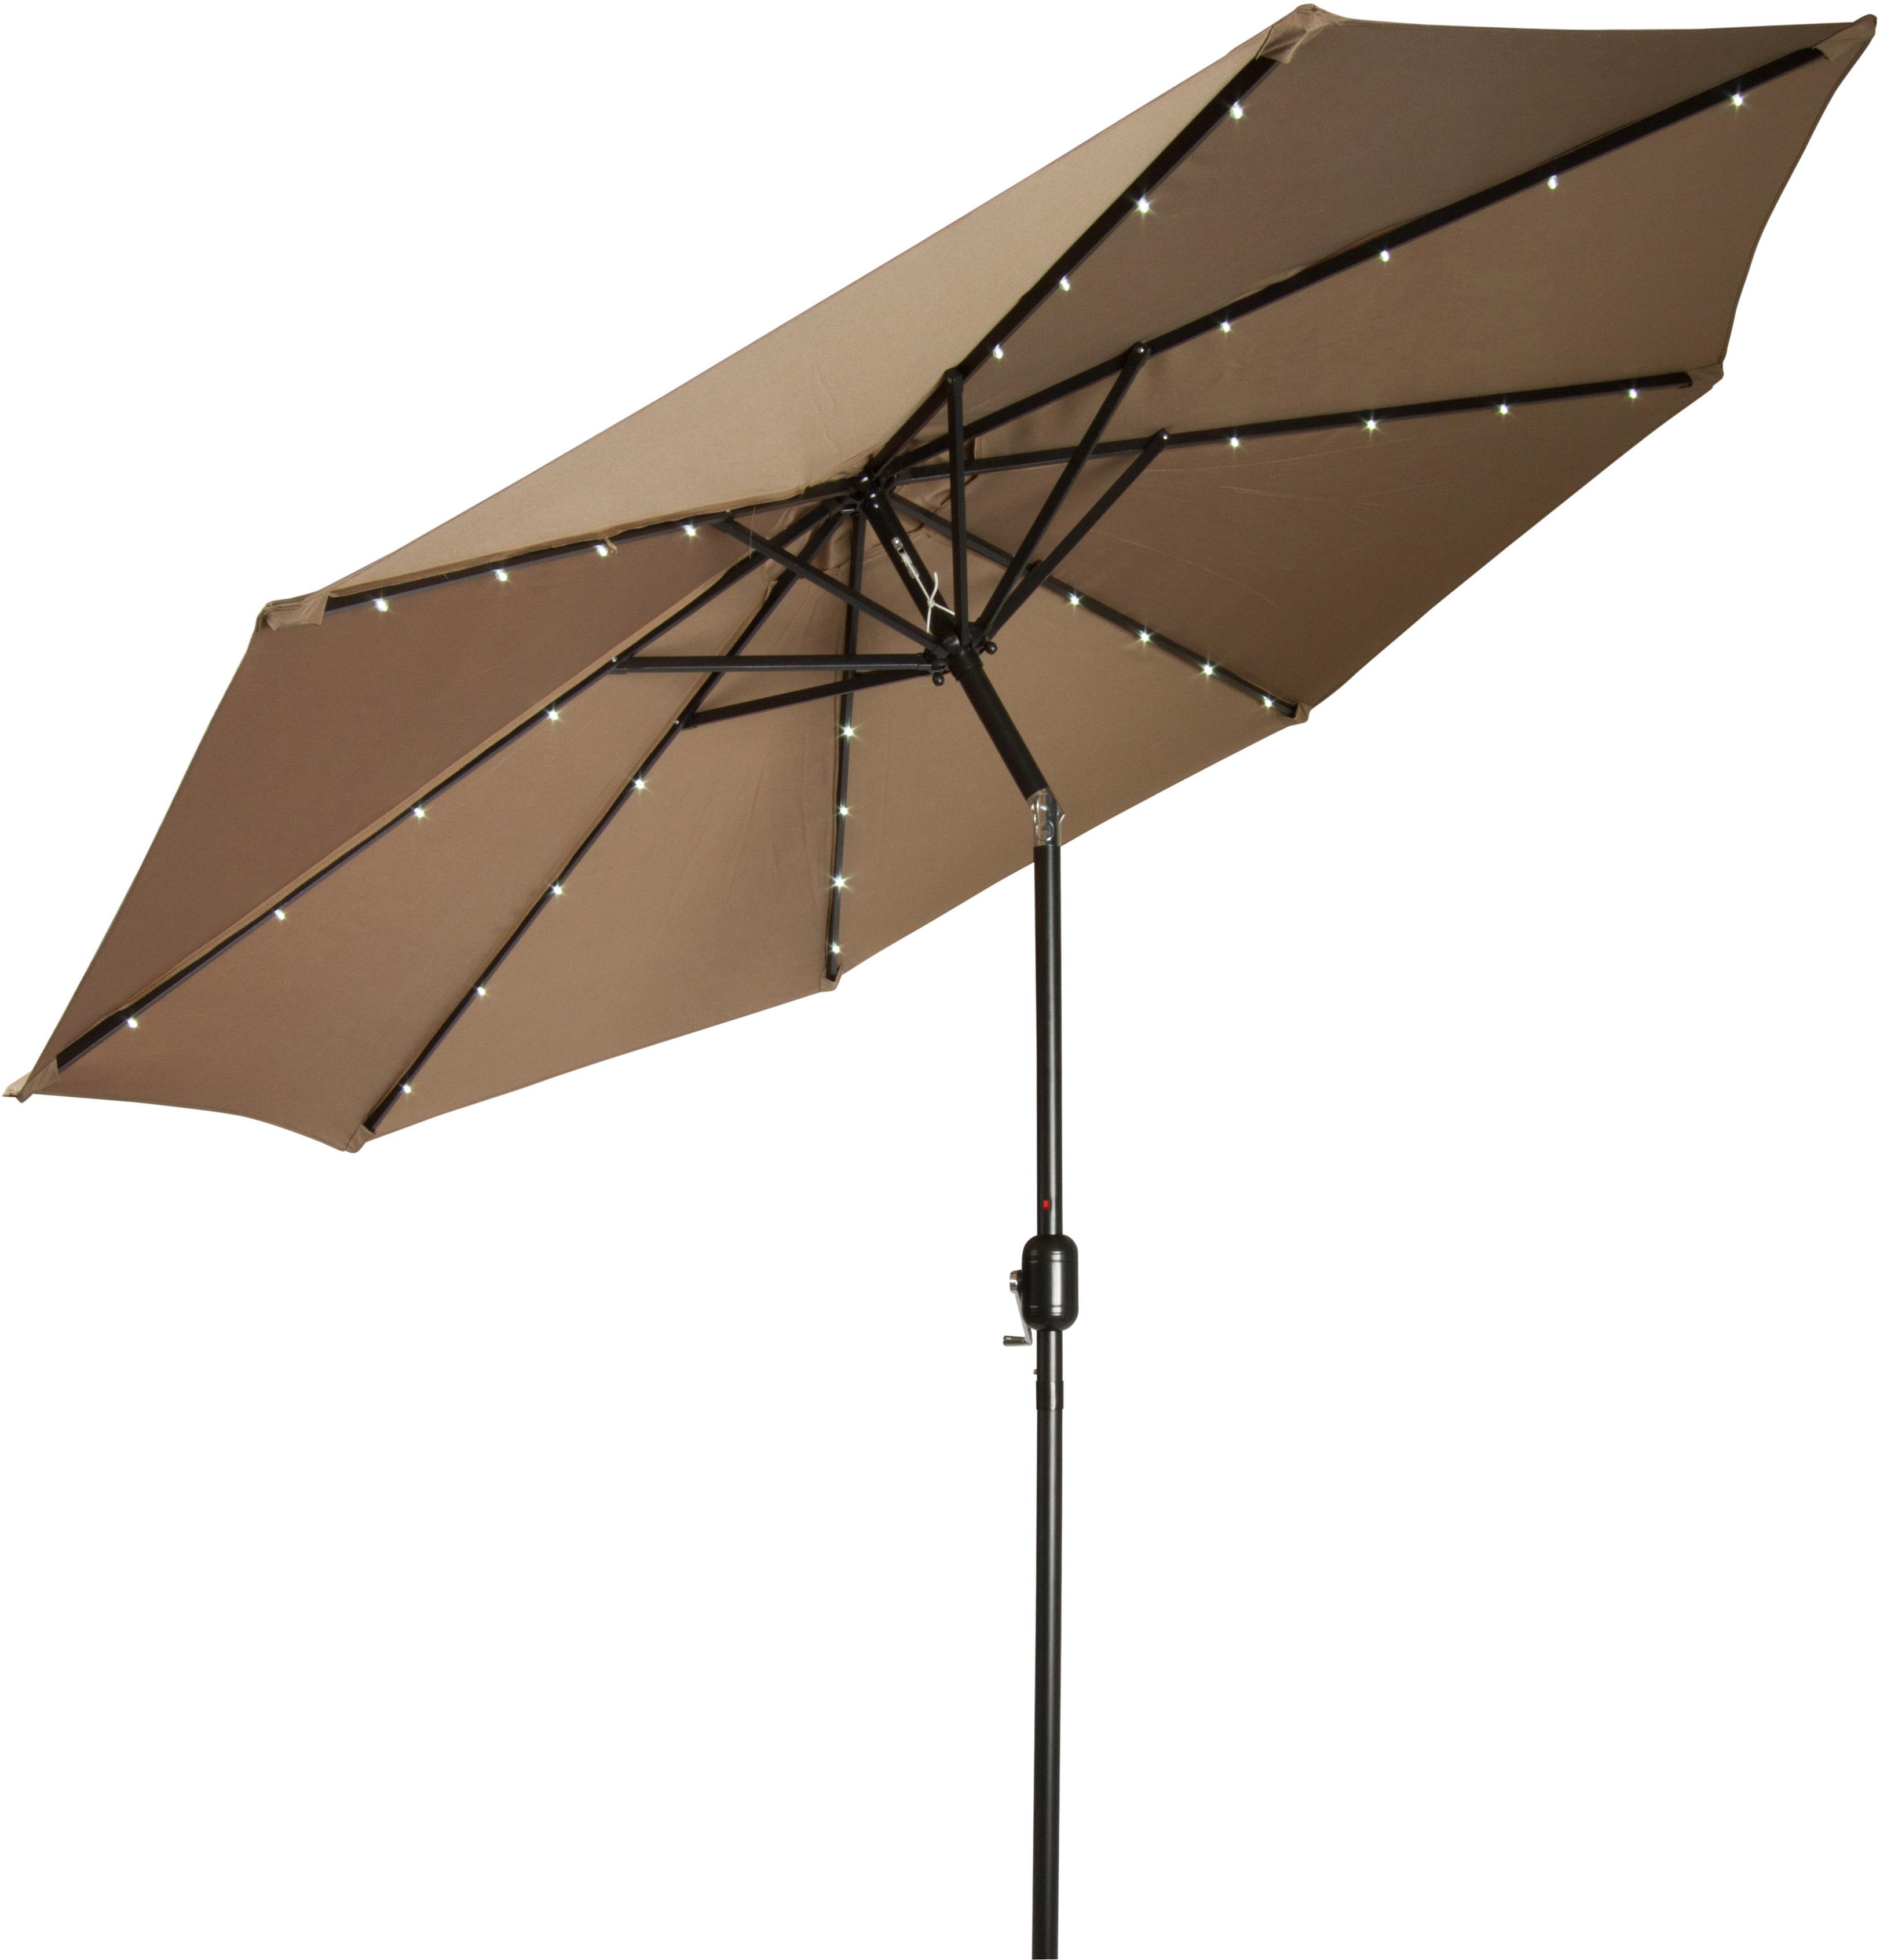 Woll 9' Lighted Market Umbrella Regarding Widely Used Woll Lighted Market Umbrellas (View 2 of 20)